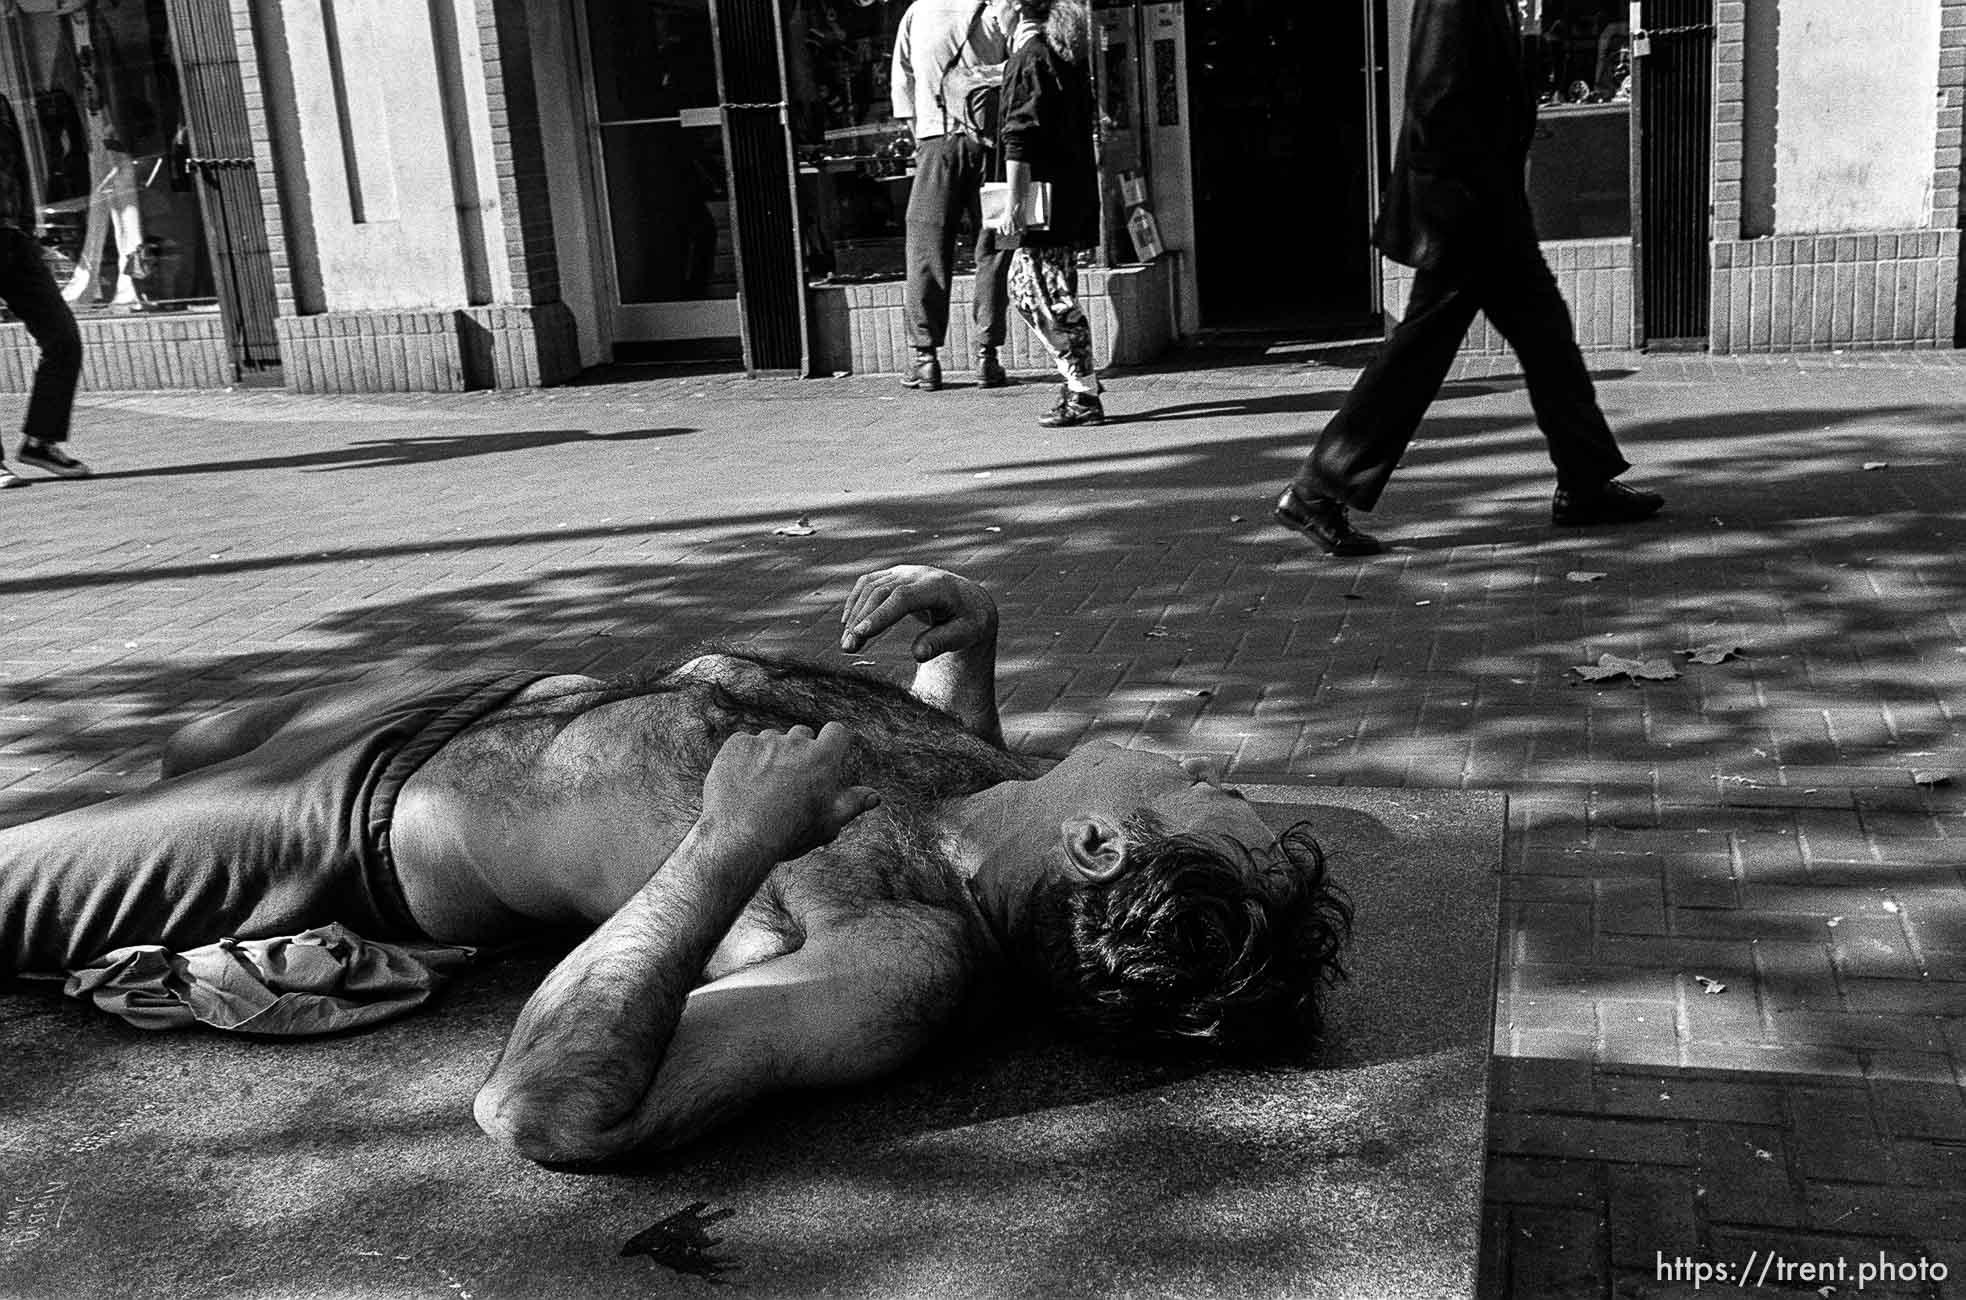 Shirtless man sleeping on street. Leica hip shots on the street.